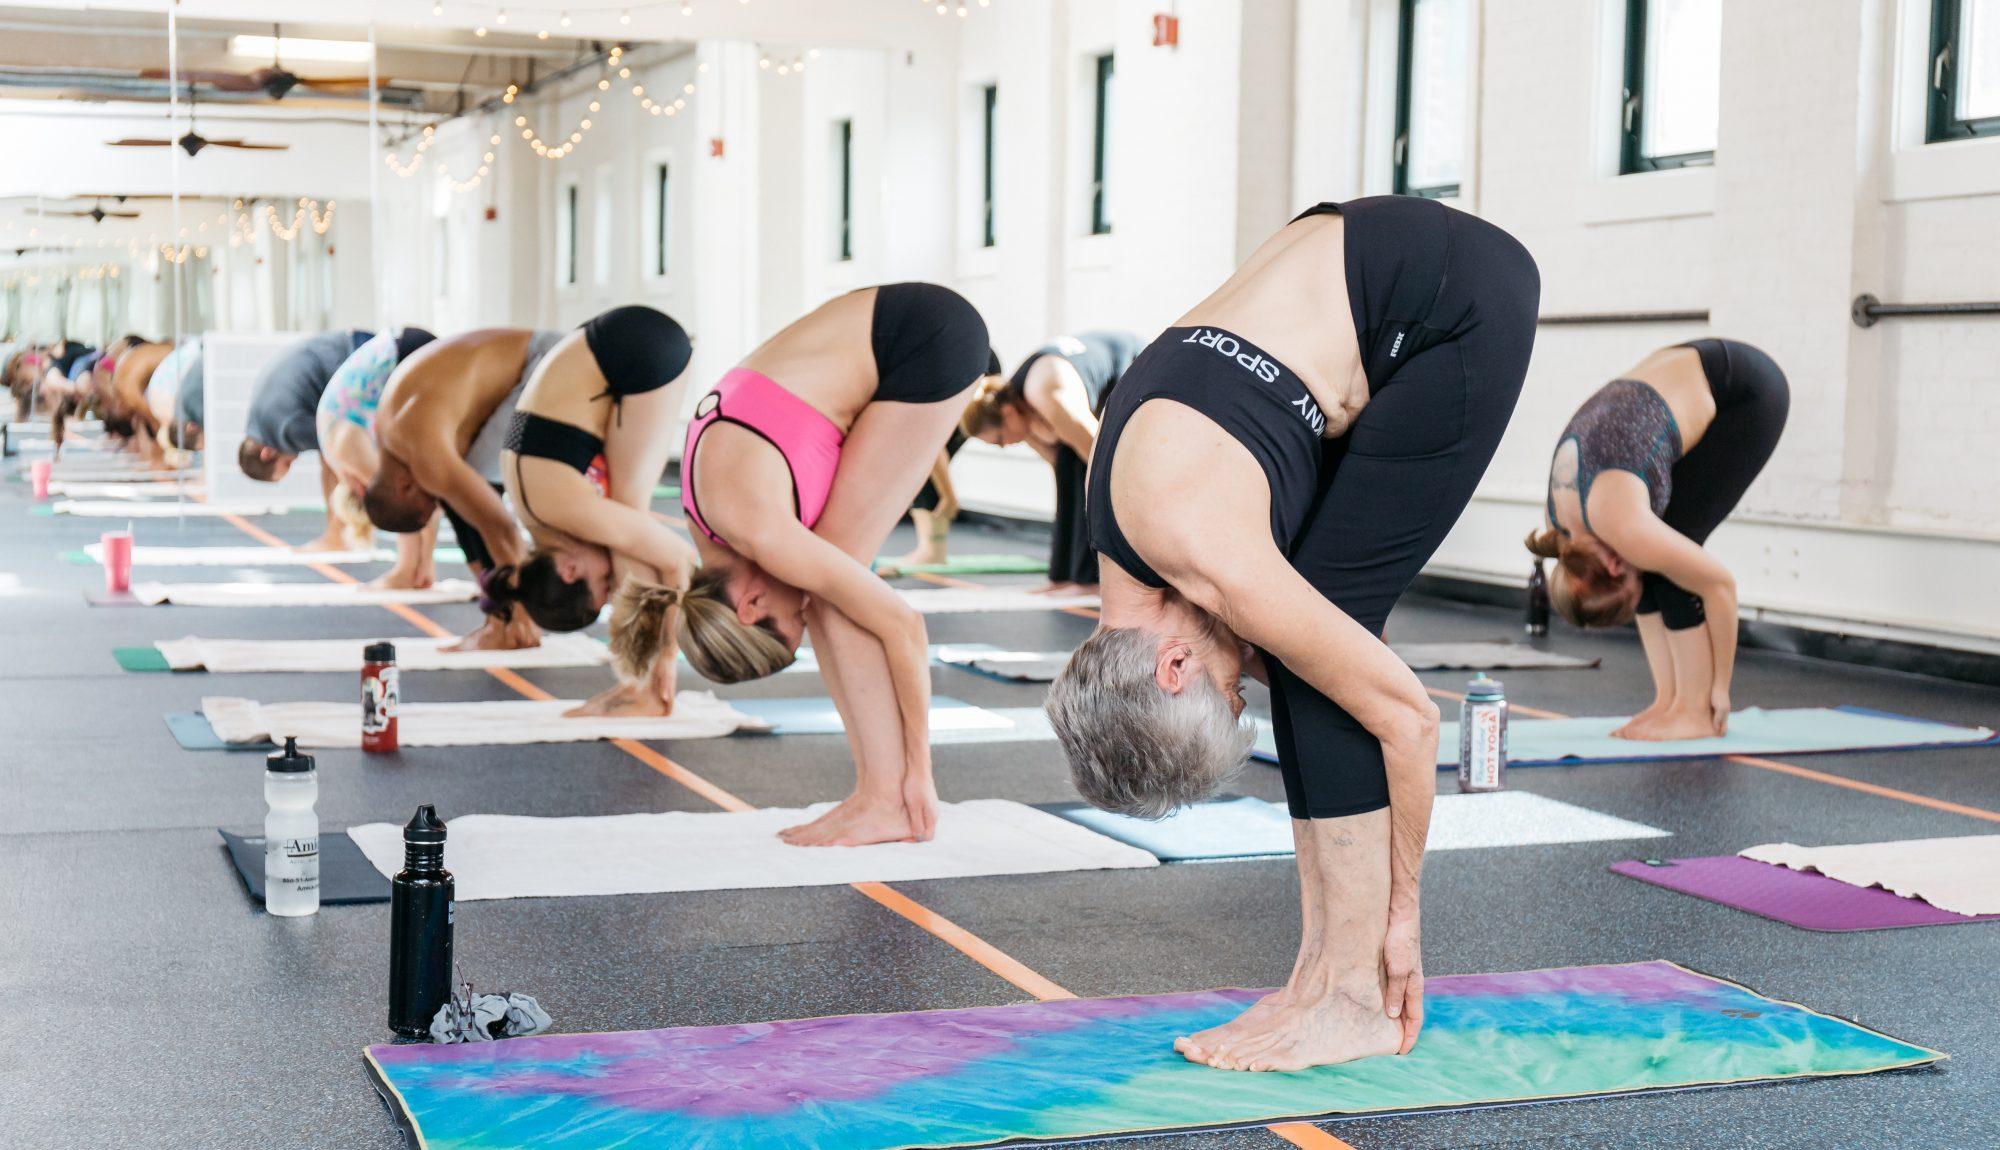 Rhode Island Hot Yoga - A Healing Hot Yoga for Every Body